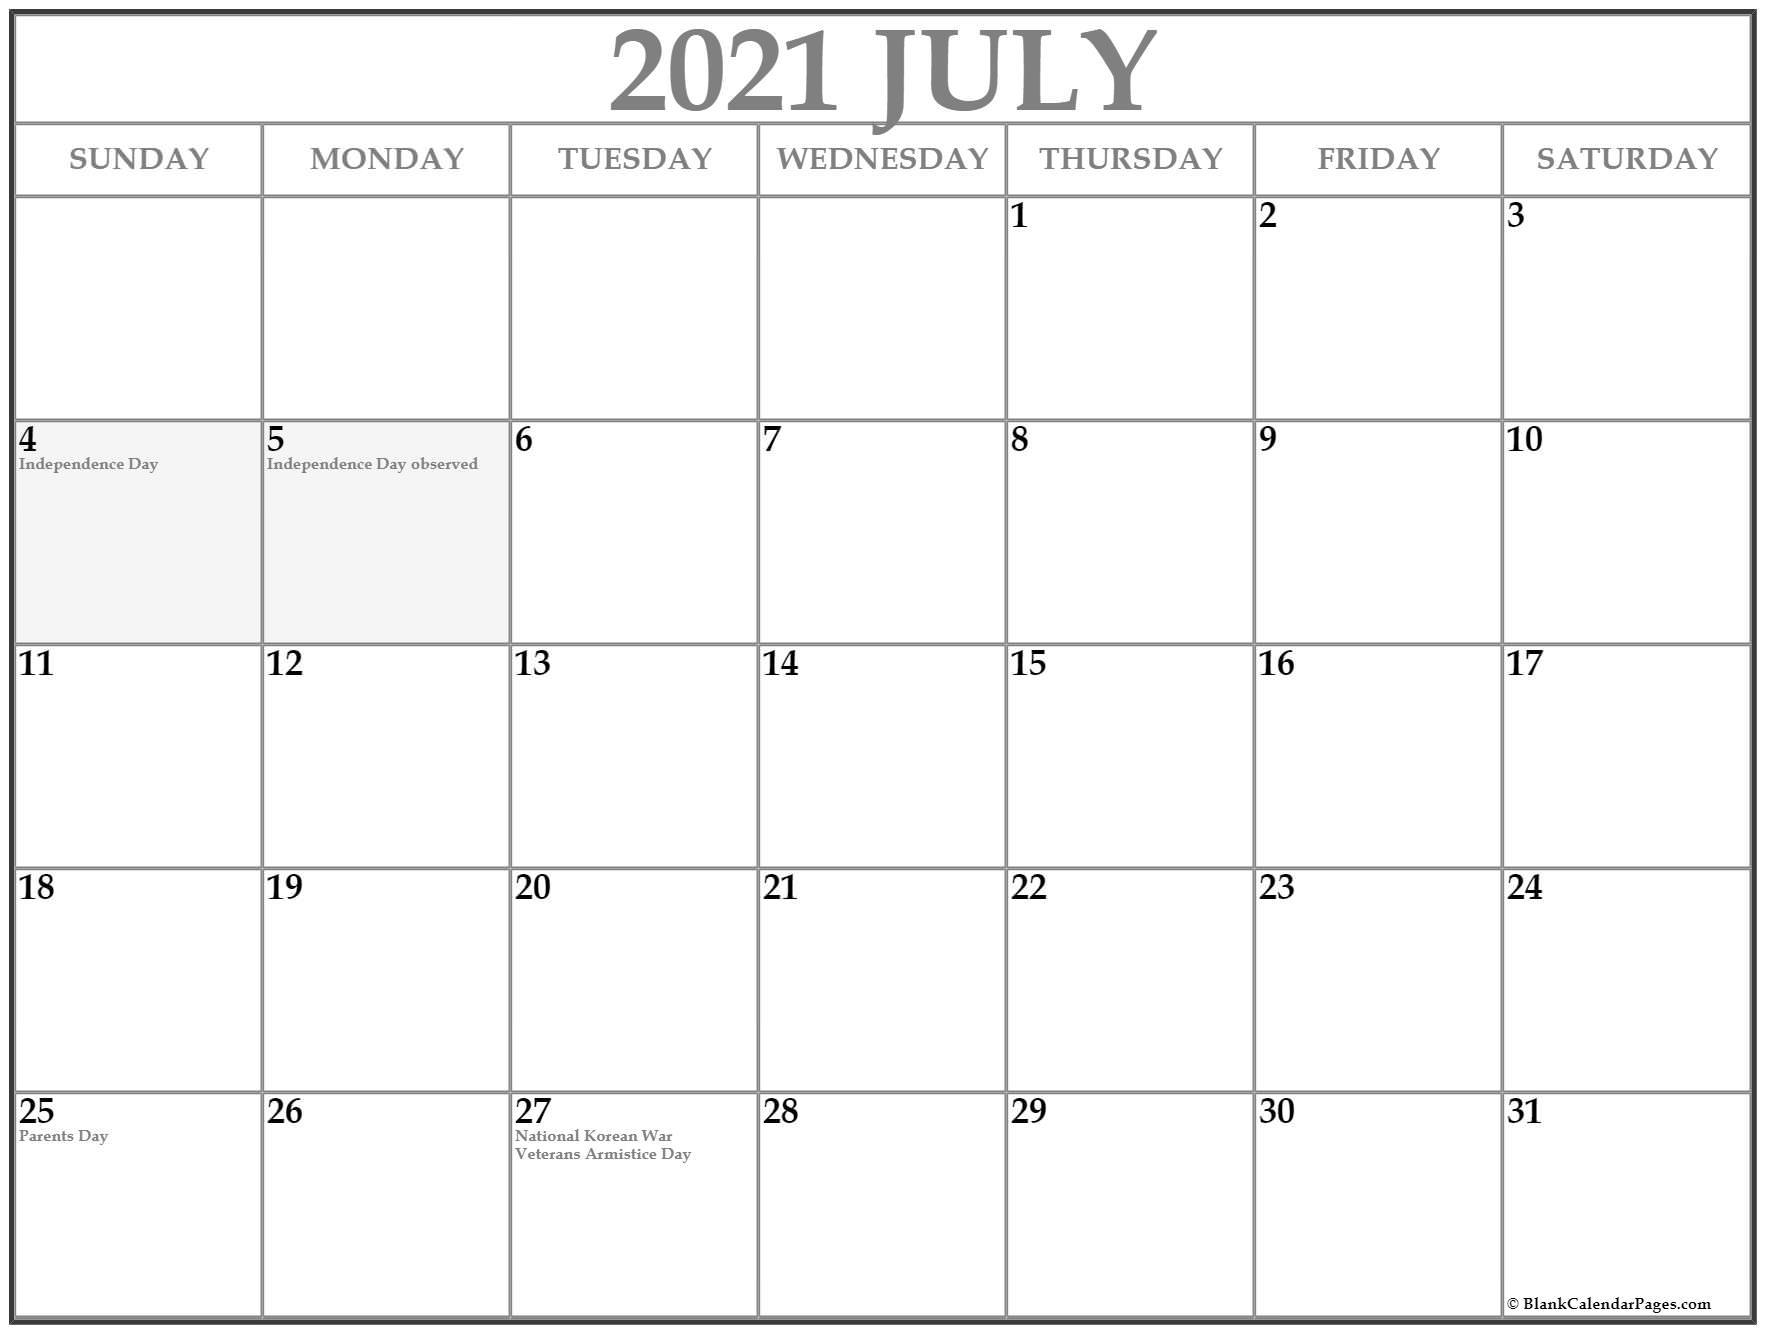 July 2021 Calendar Holidays